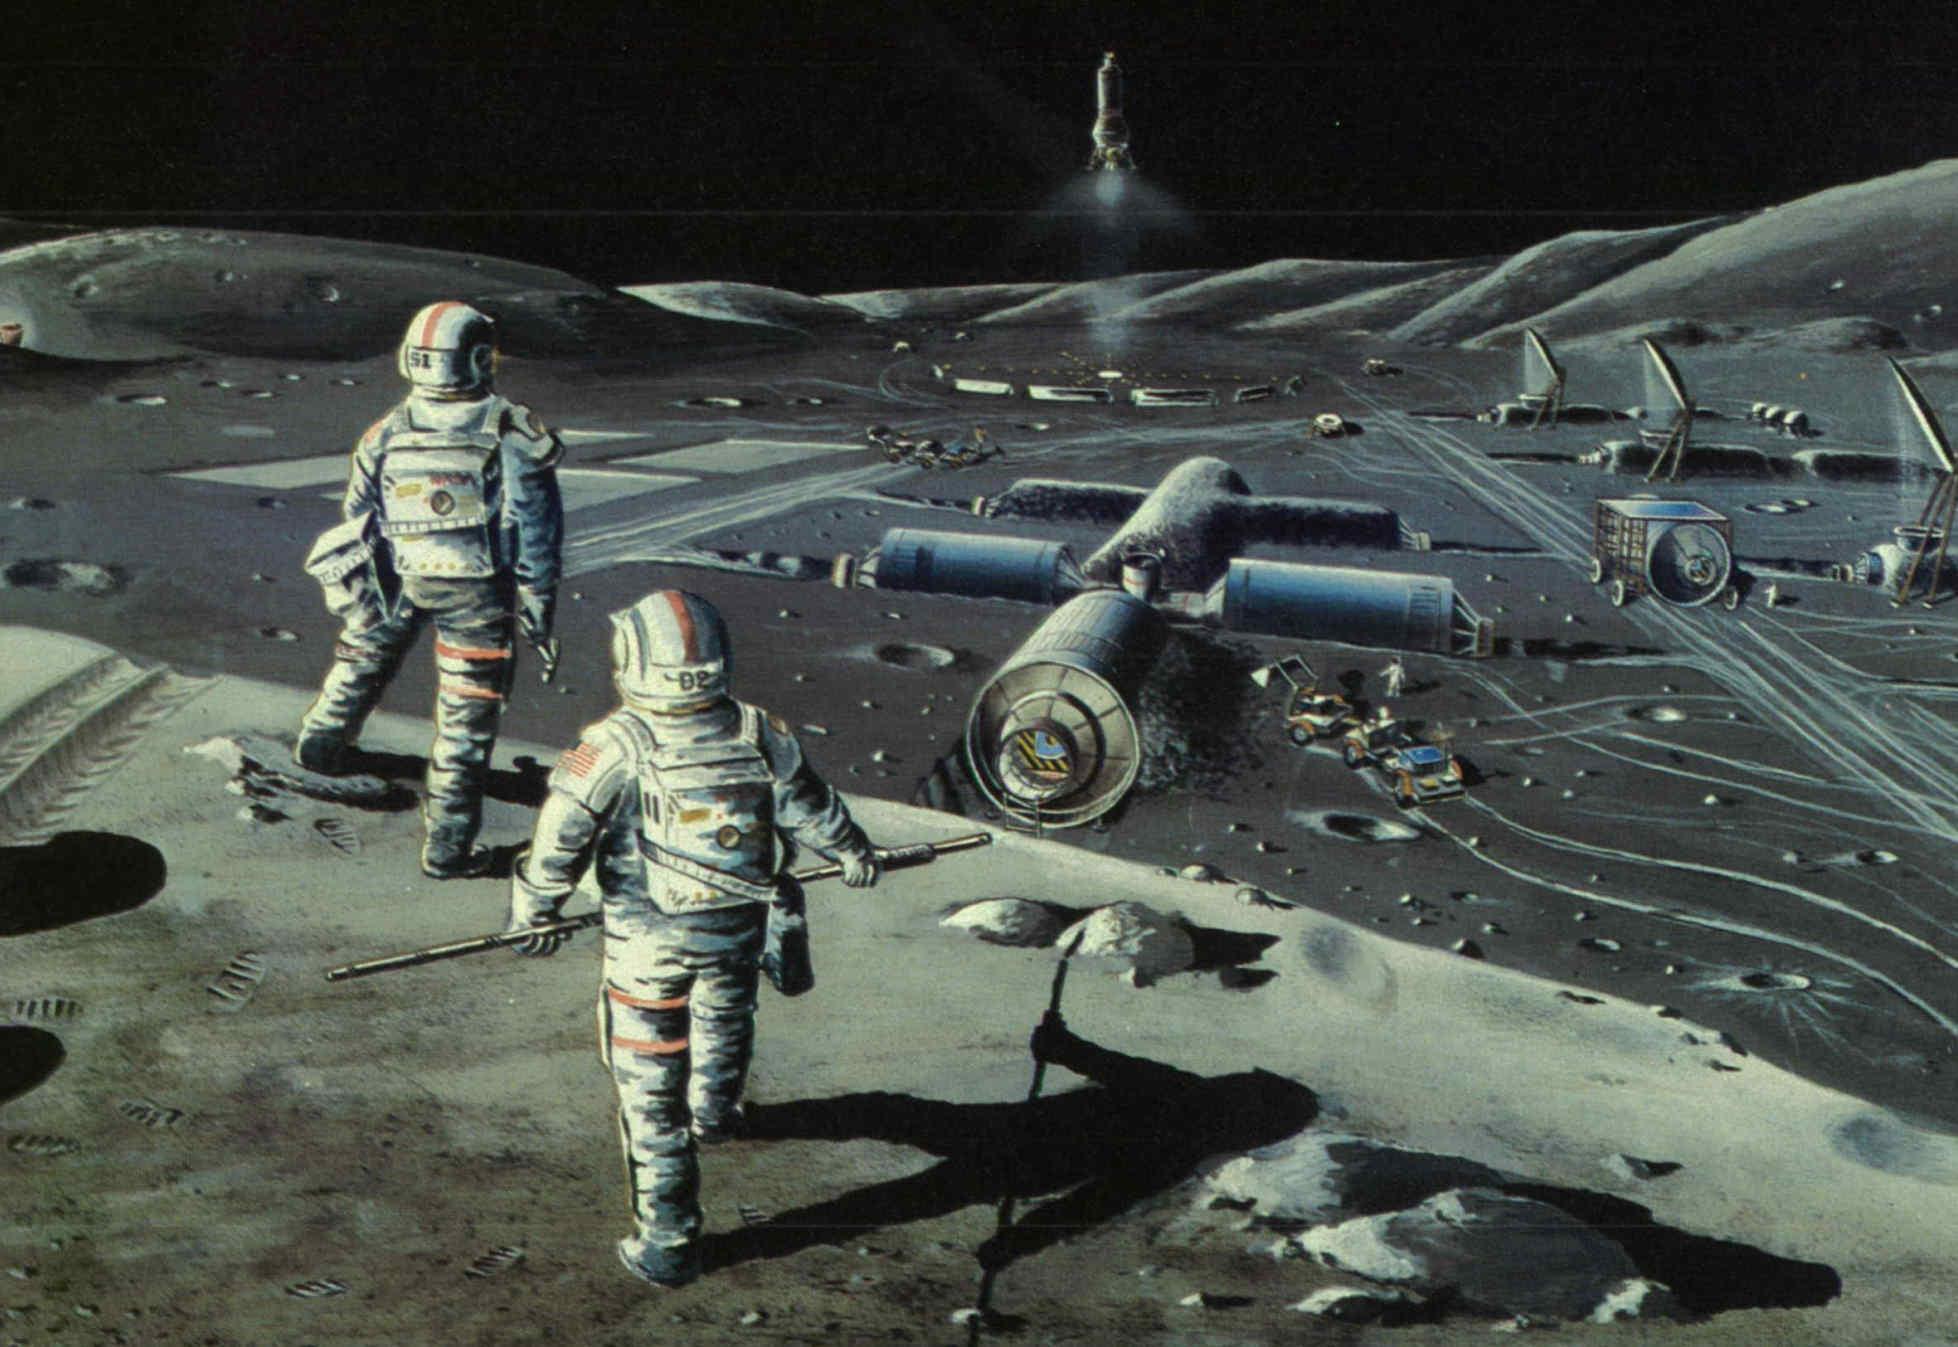 Illustrated lunar colony from NASA SP 509. Credit: NASA.